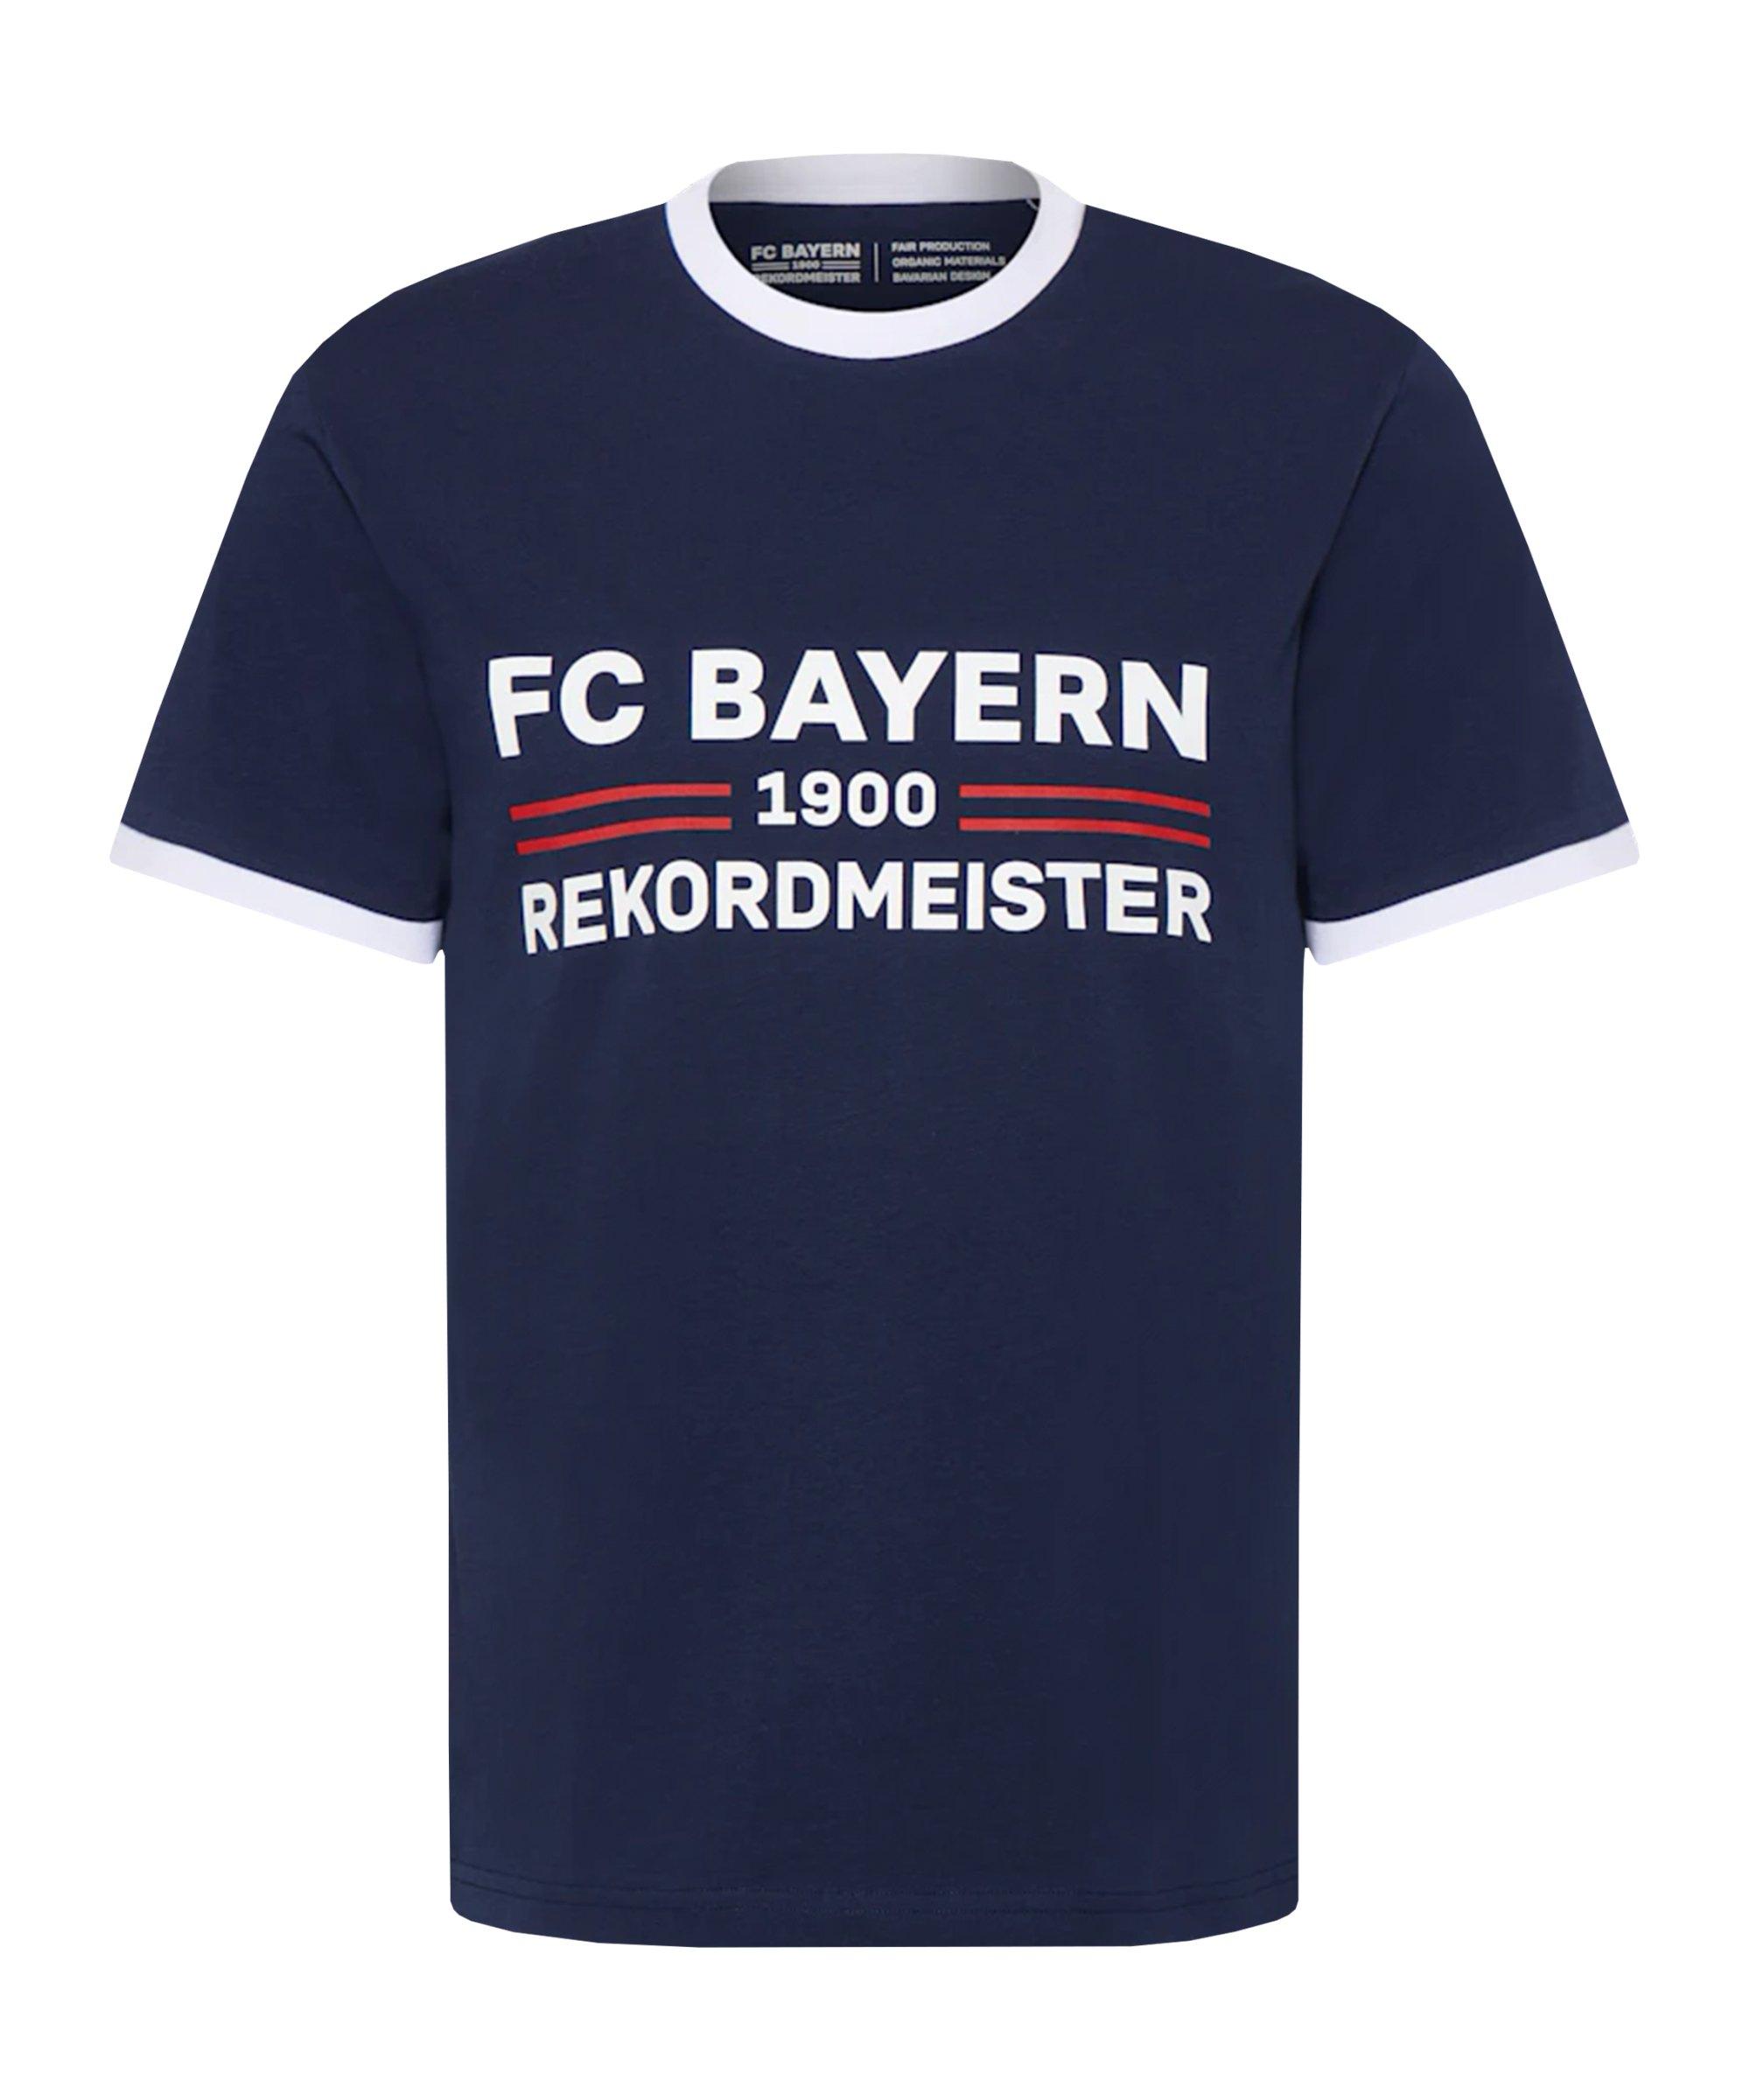 FC Bayern München Rekordmeister T-Shirt Blau - blau